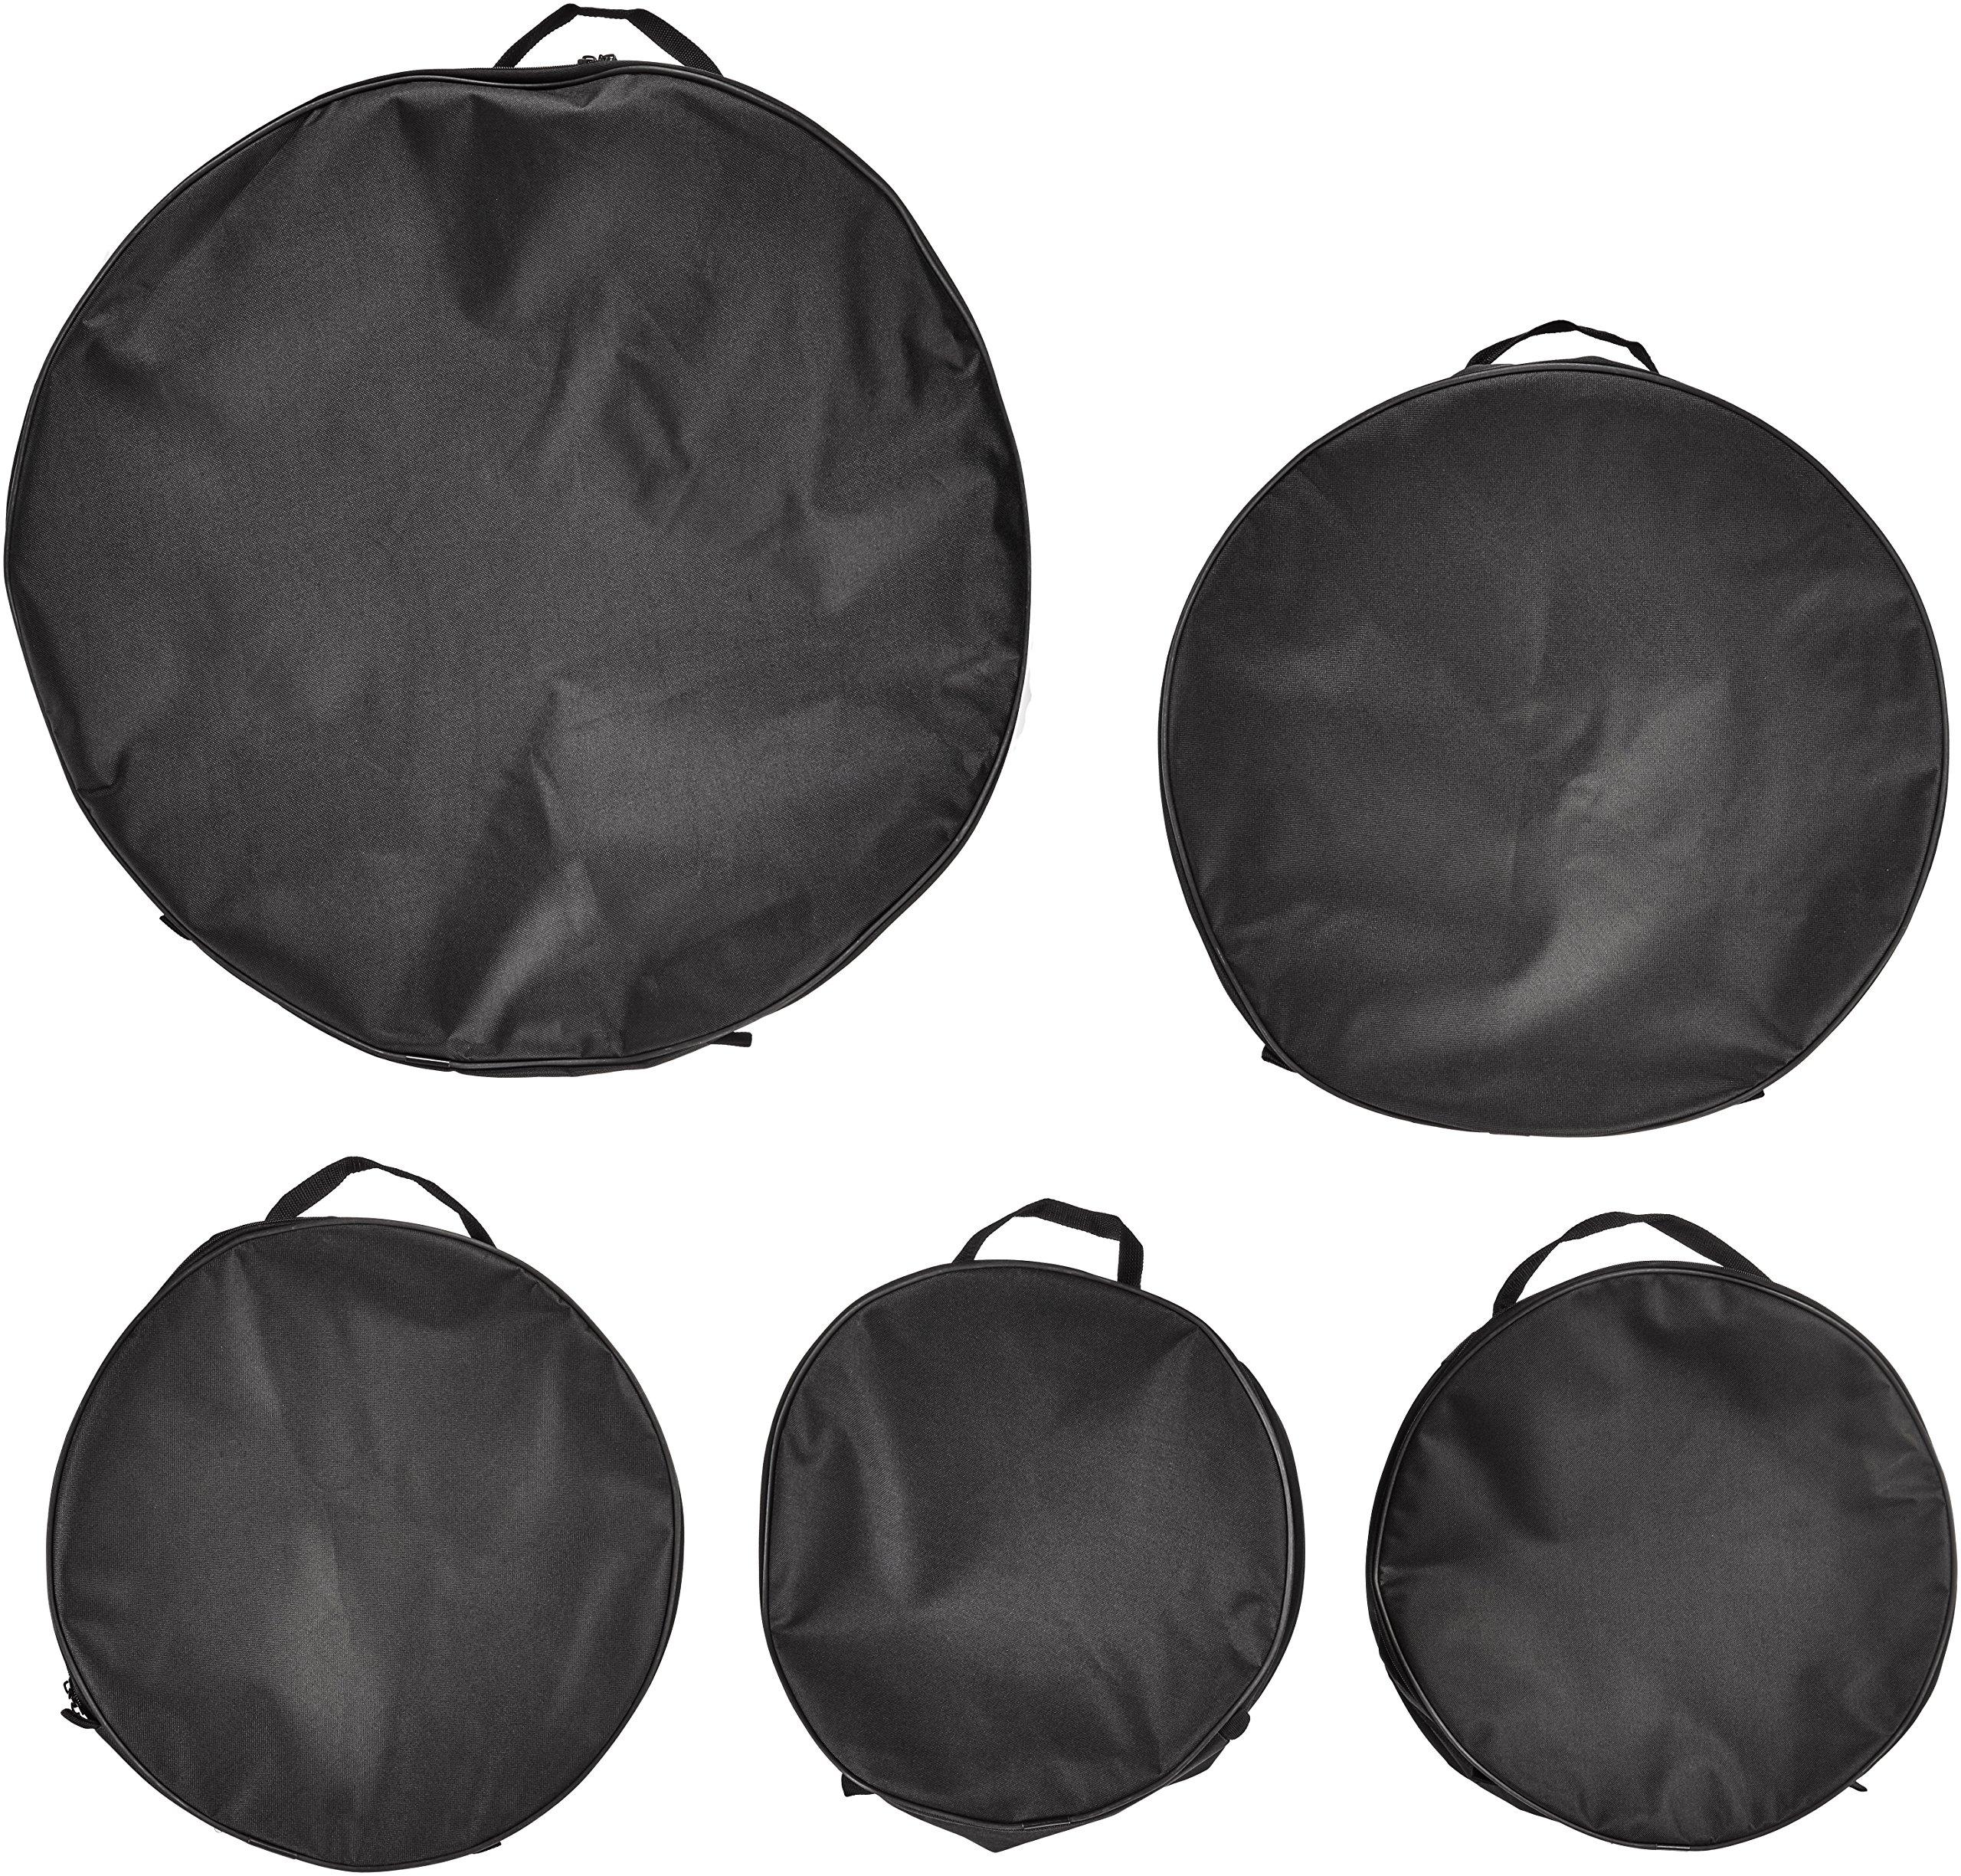 Universal Percussion Pro 4 DMC500 Nylon Standard Drum Bag Set, 5-Piece